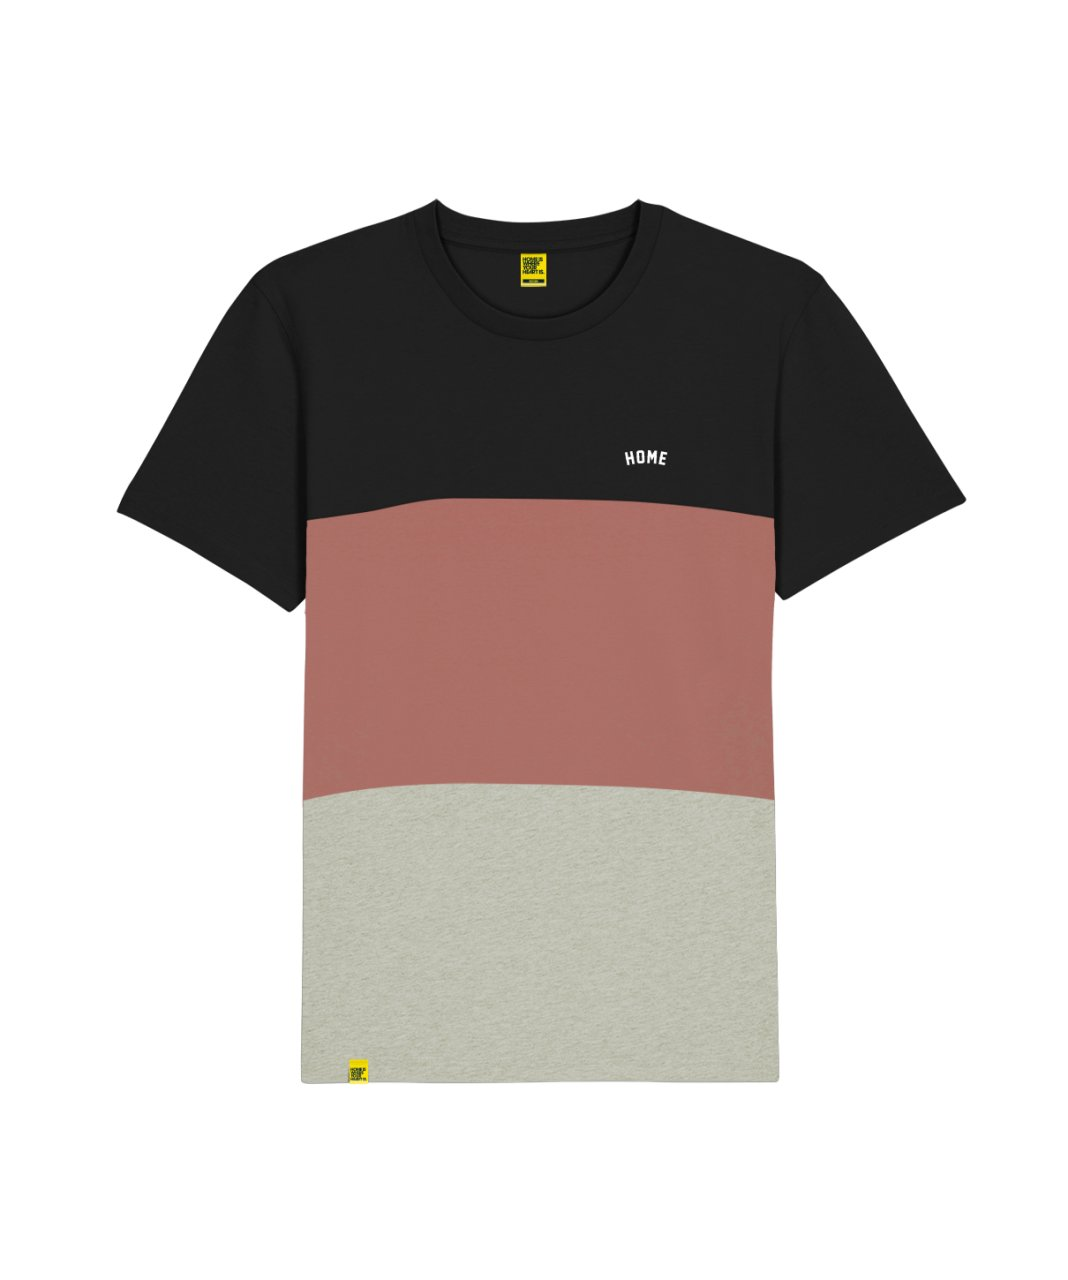 Home Tricolor T-Shirt